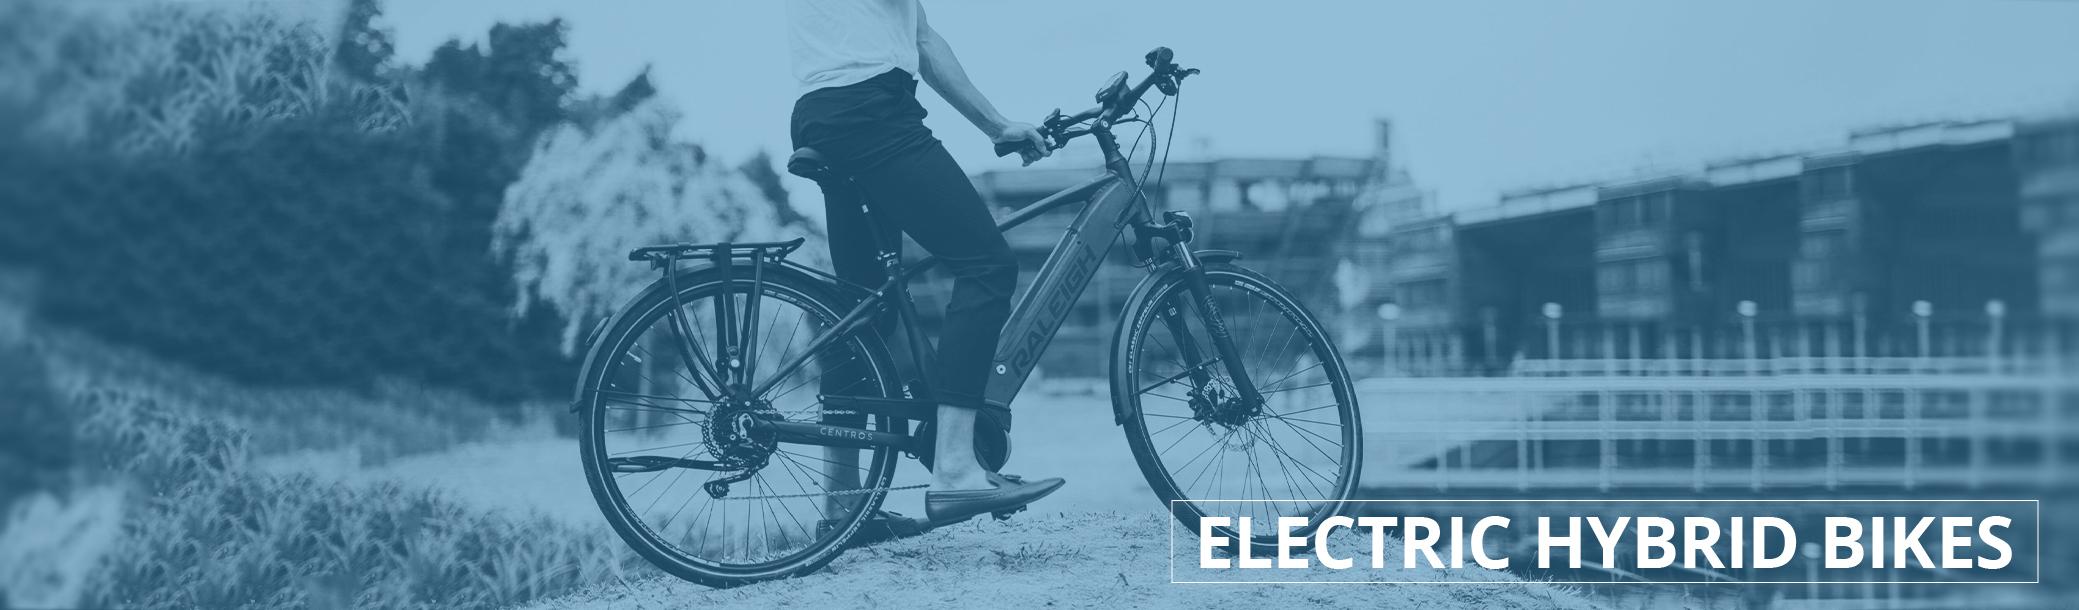 Electric Hybrid Bikes